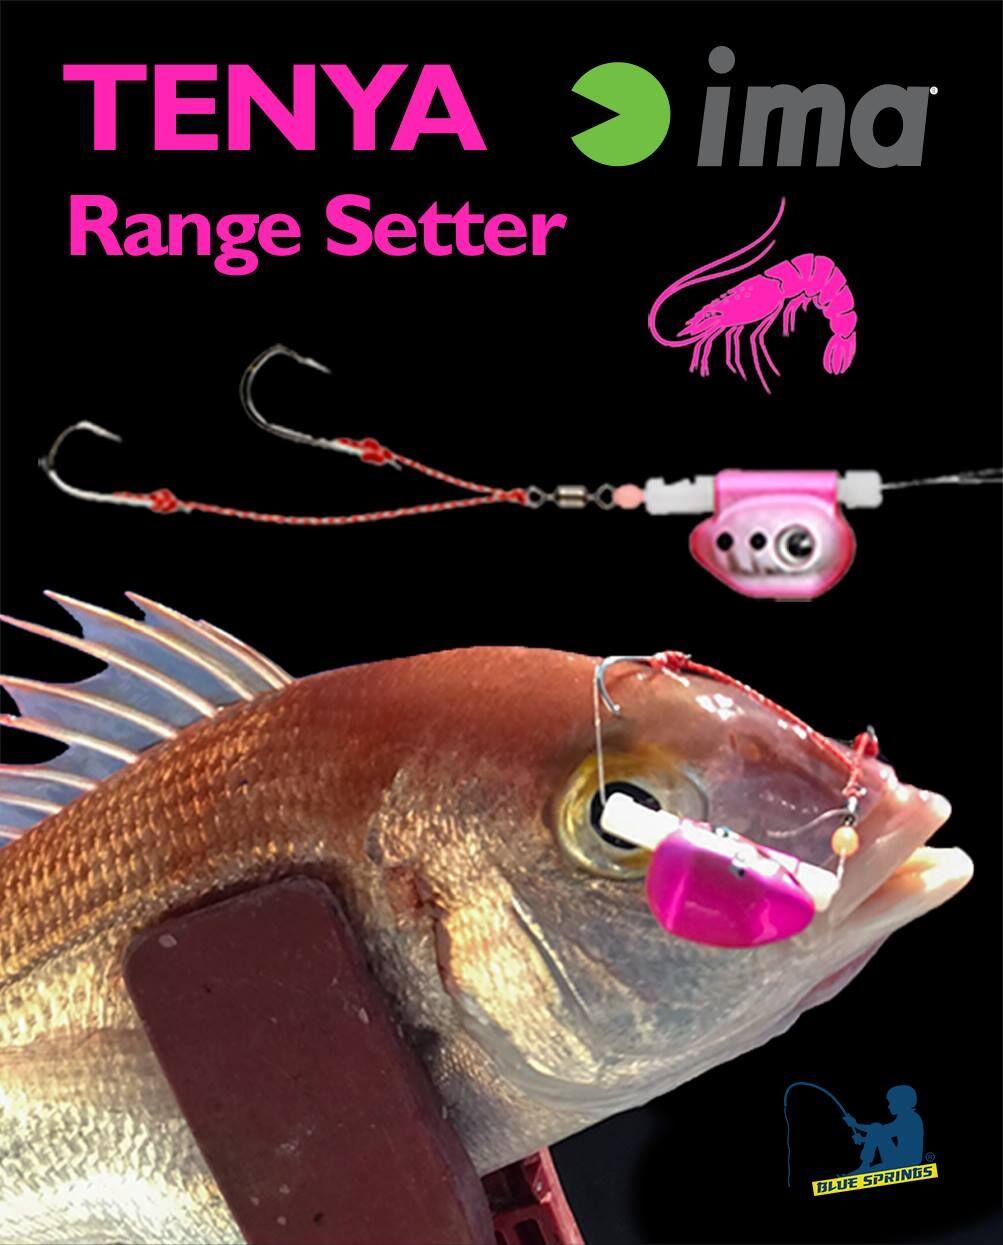 Ima Tenya Range Setter